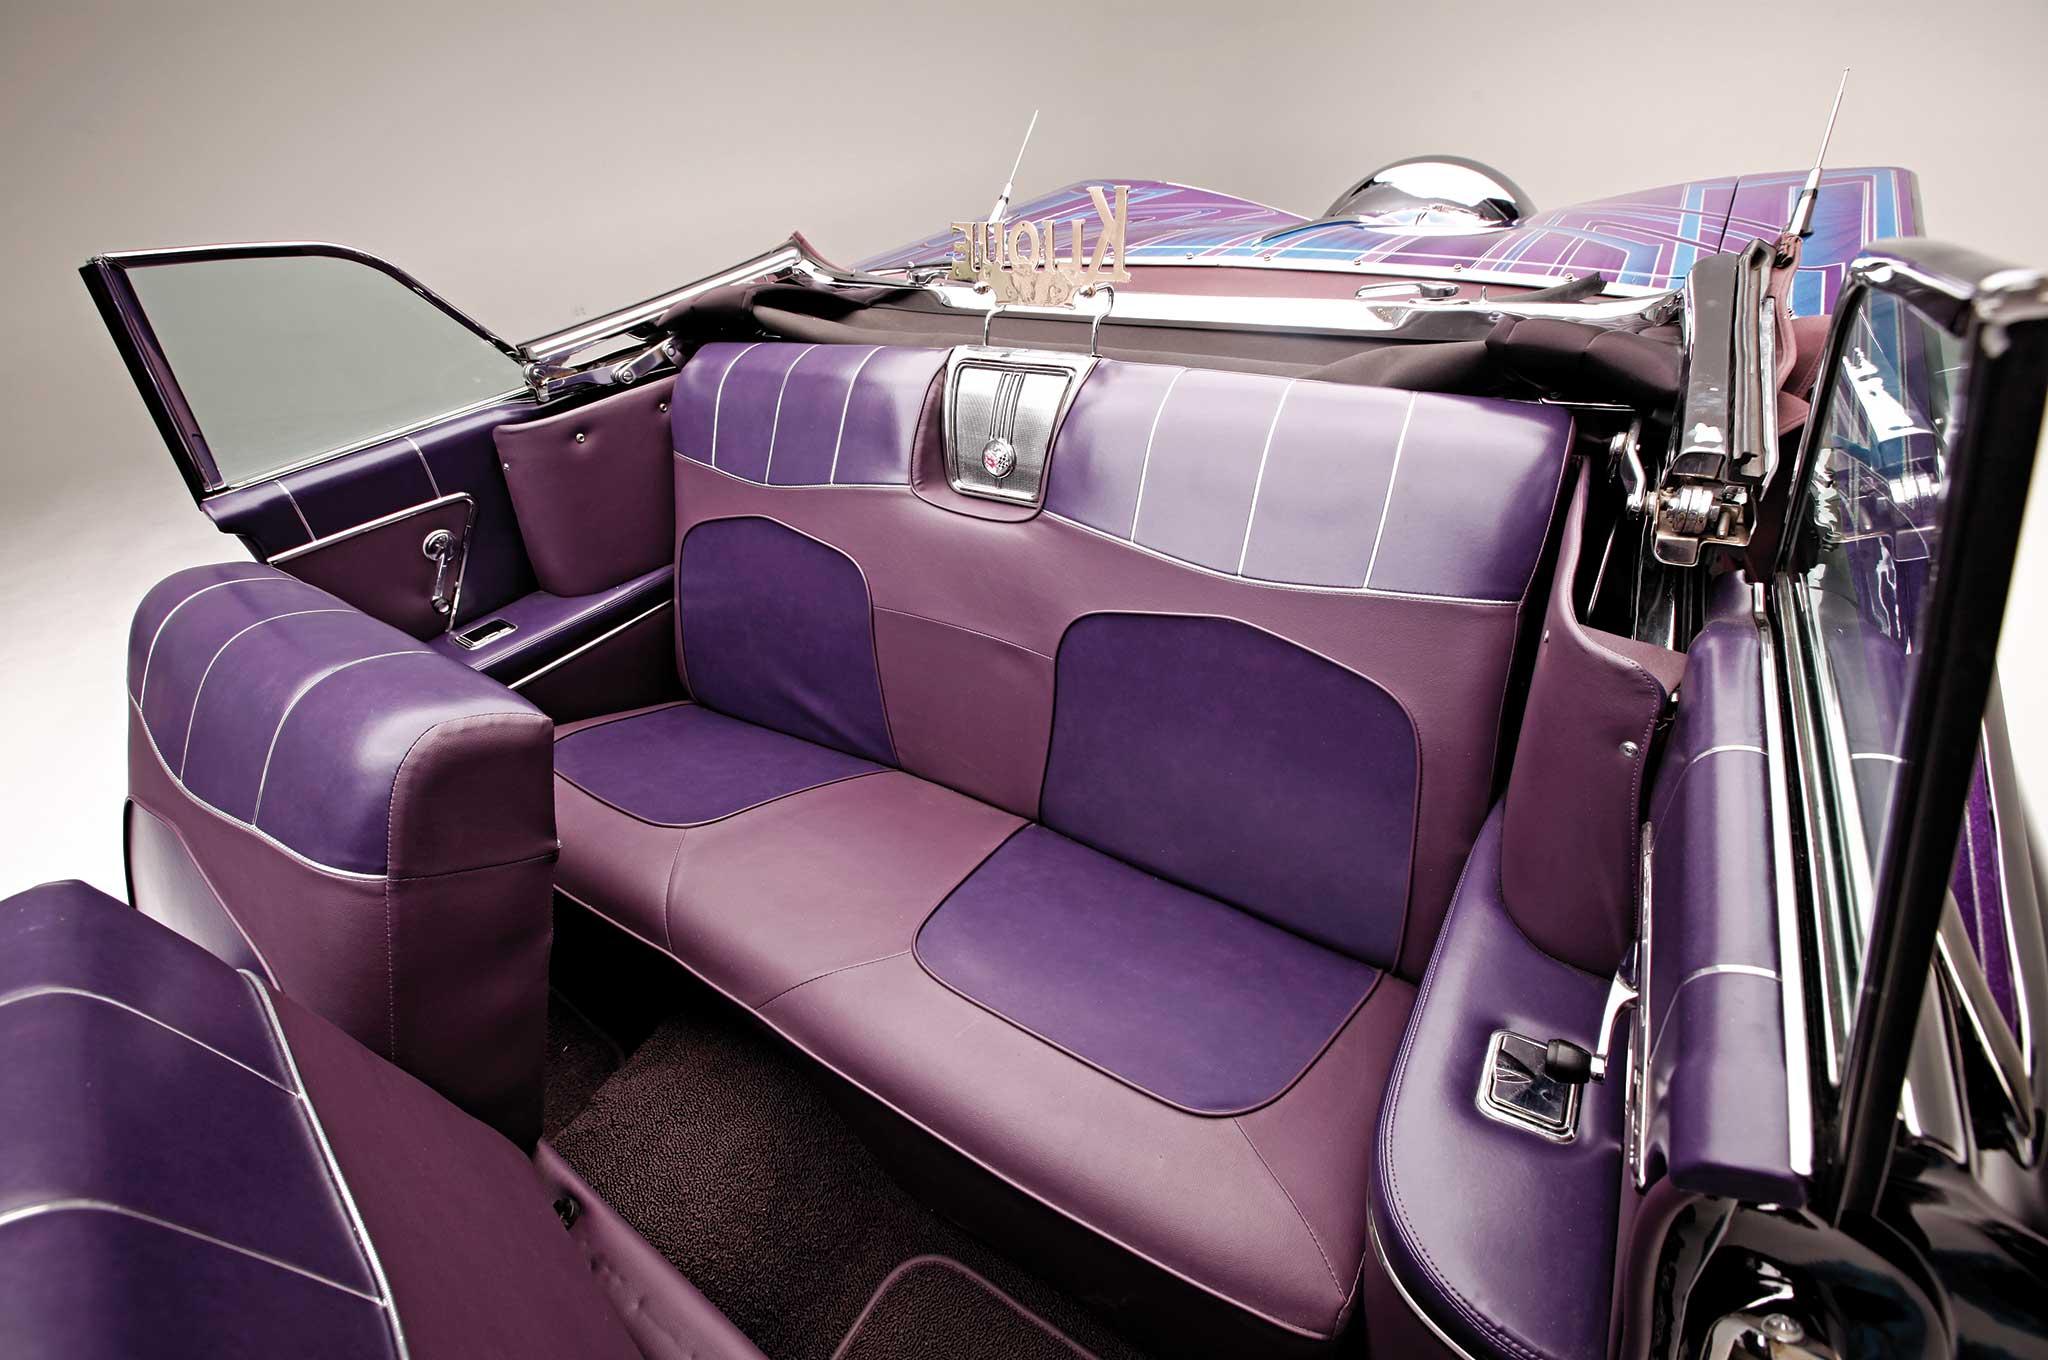 007 1959 chevrolet impala convertible custom backseats